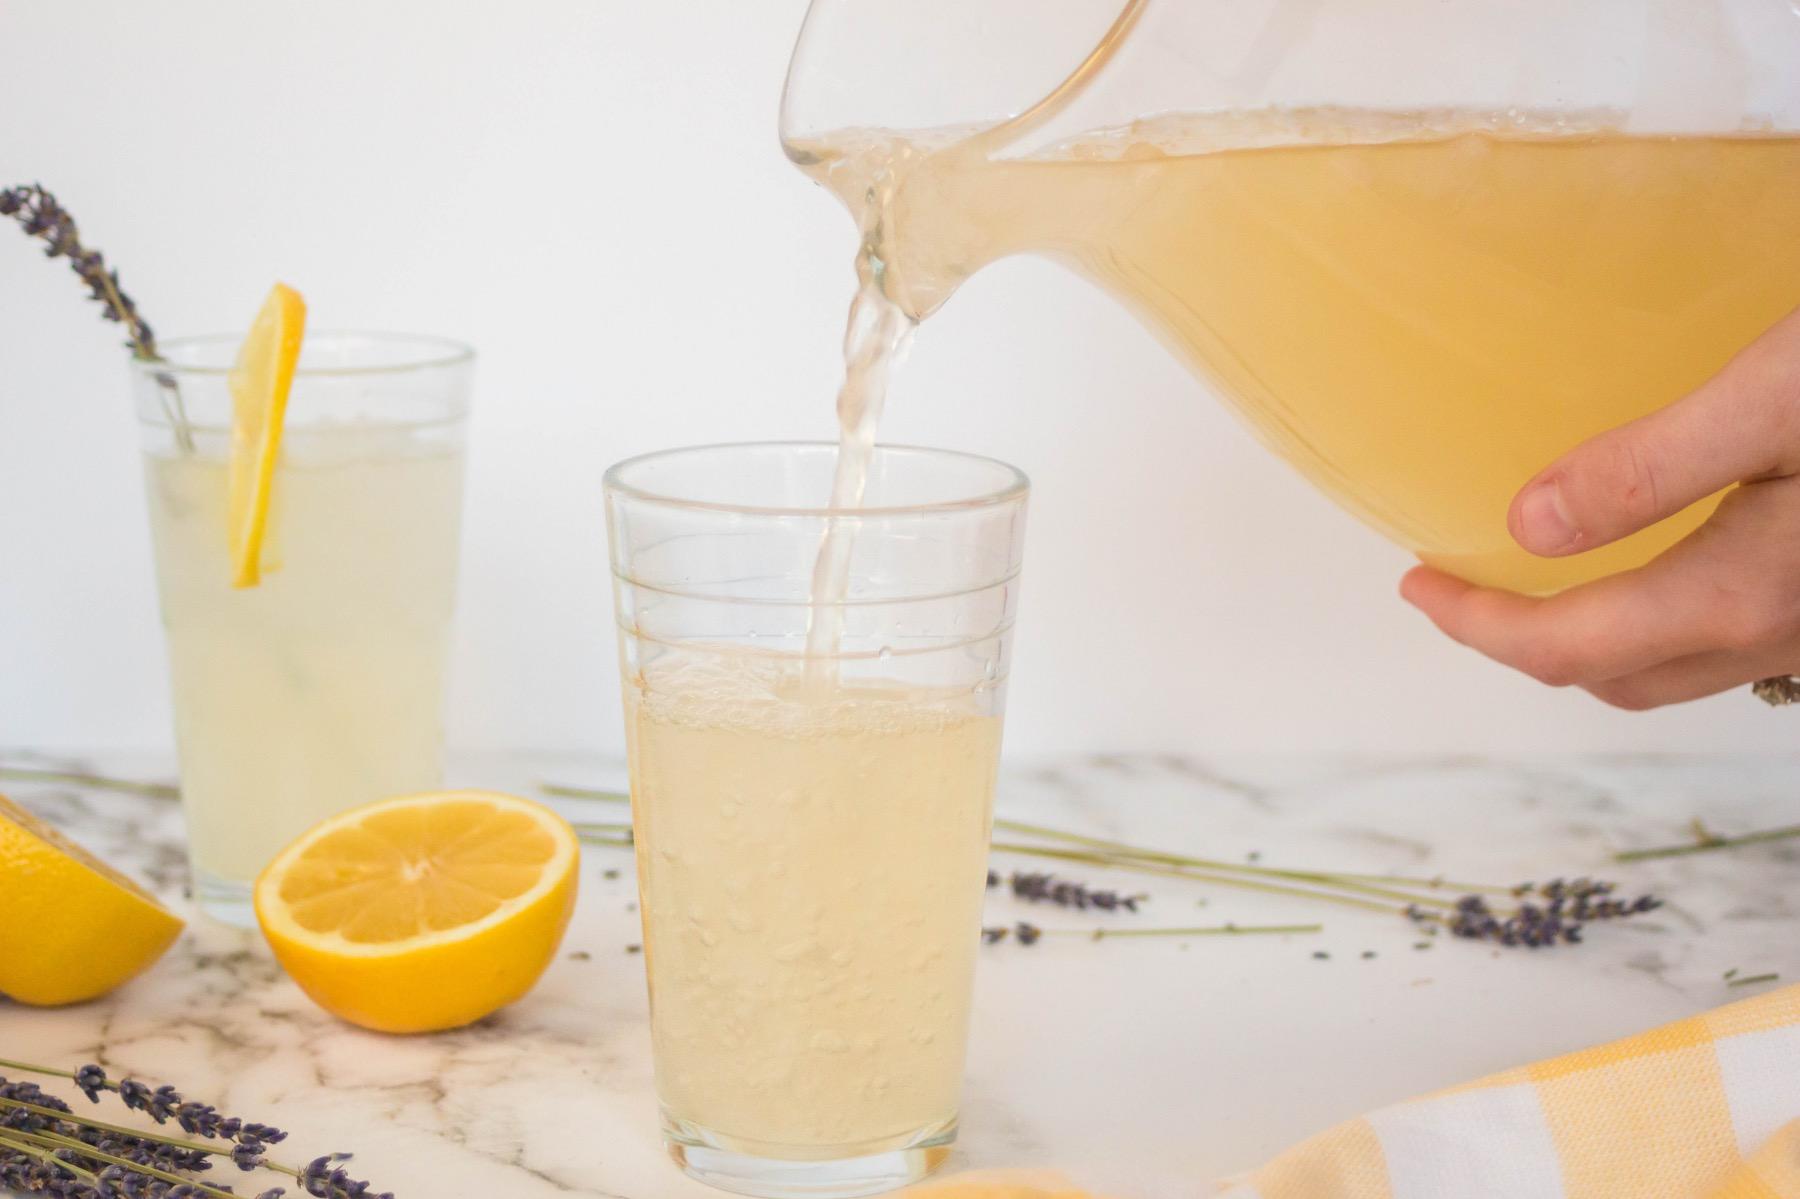 serve homemade lavender lemonade in a tall glass